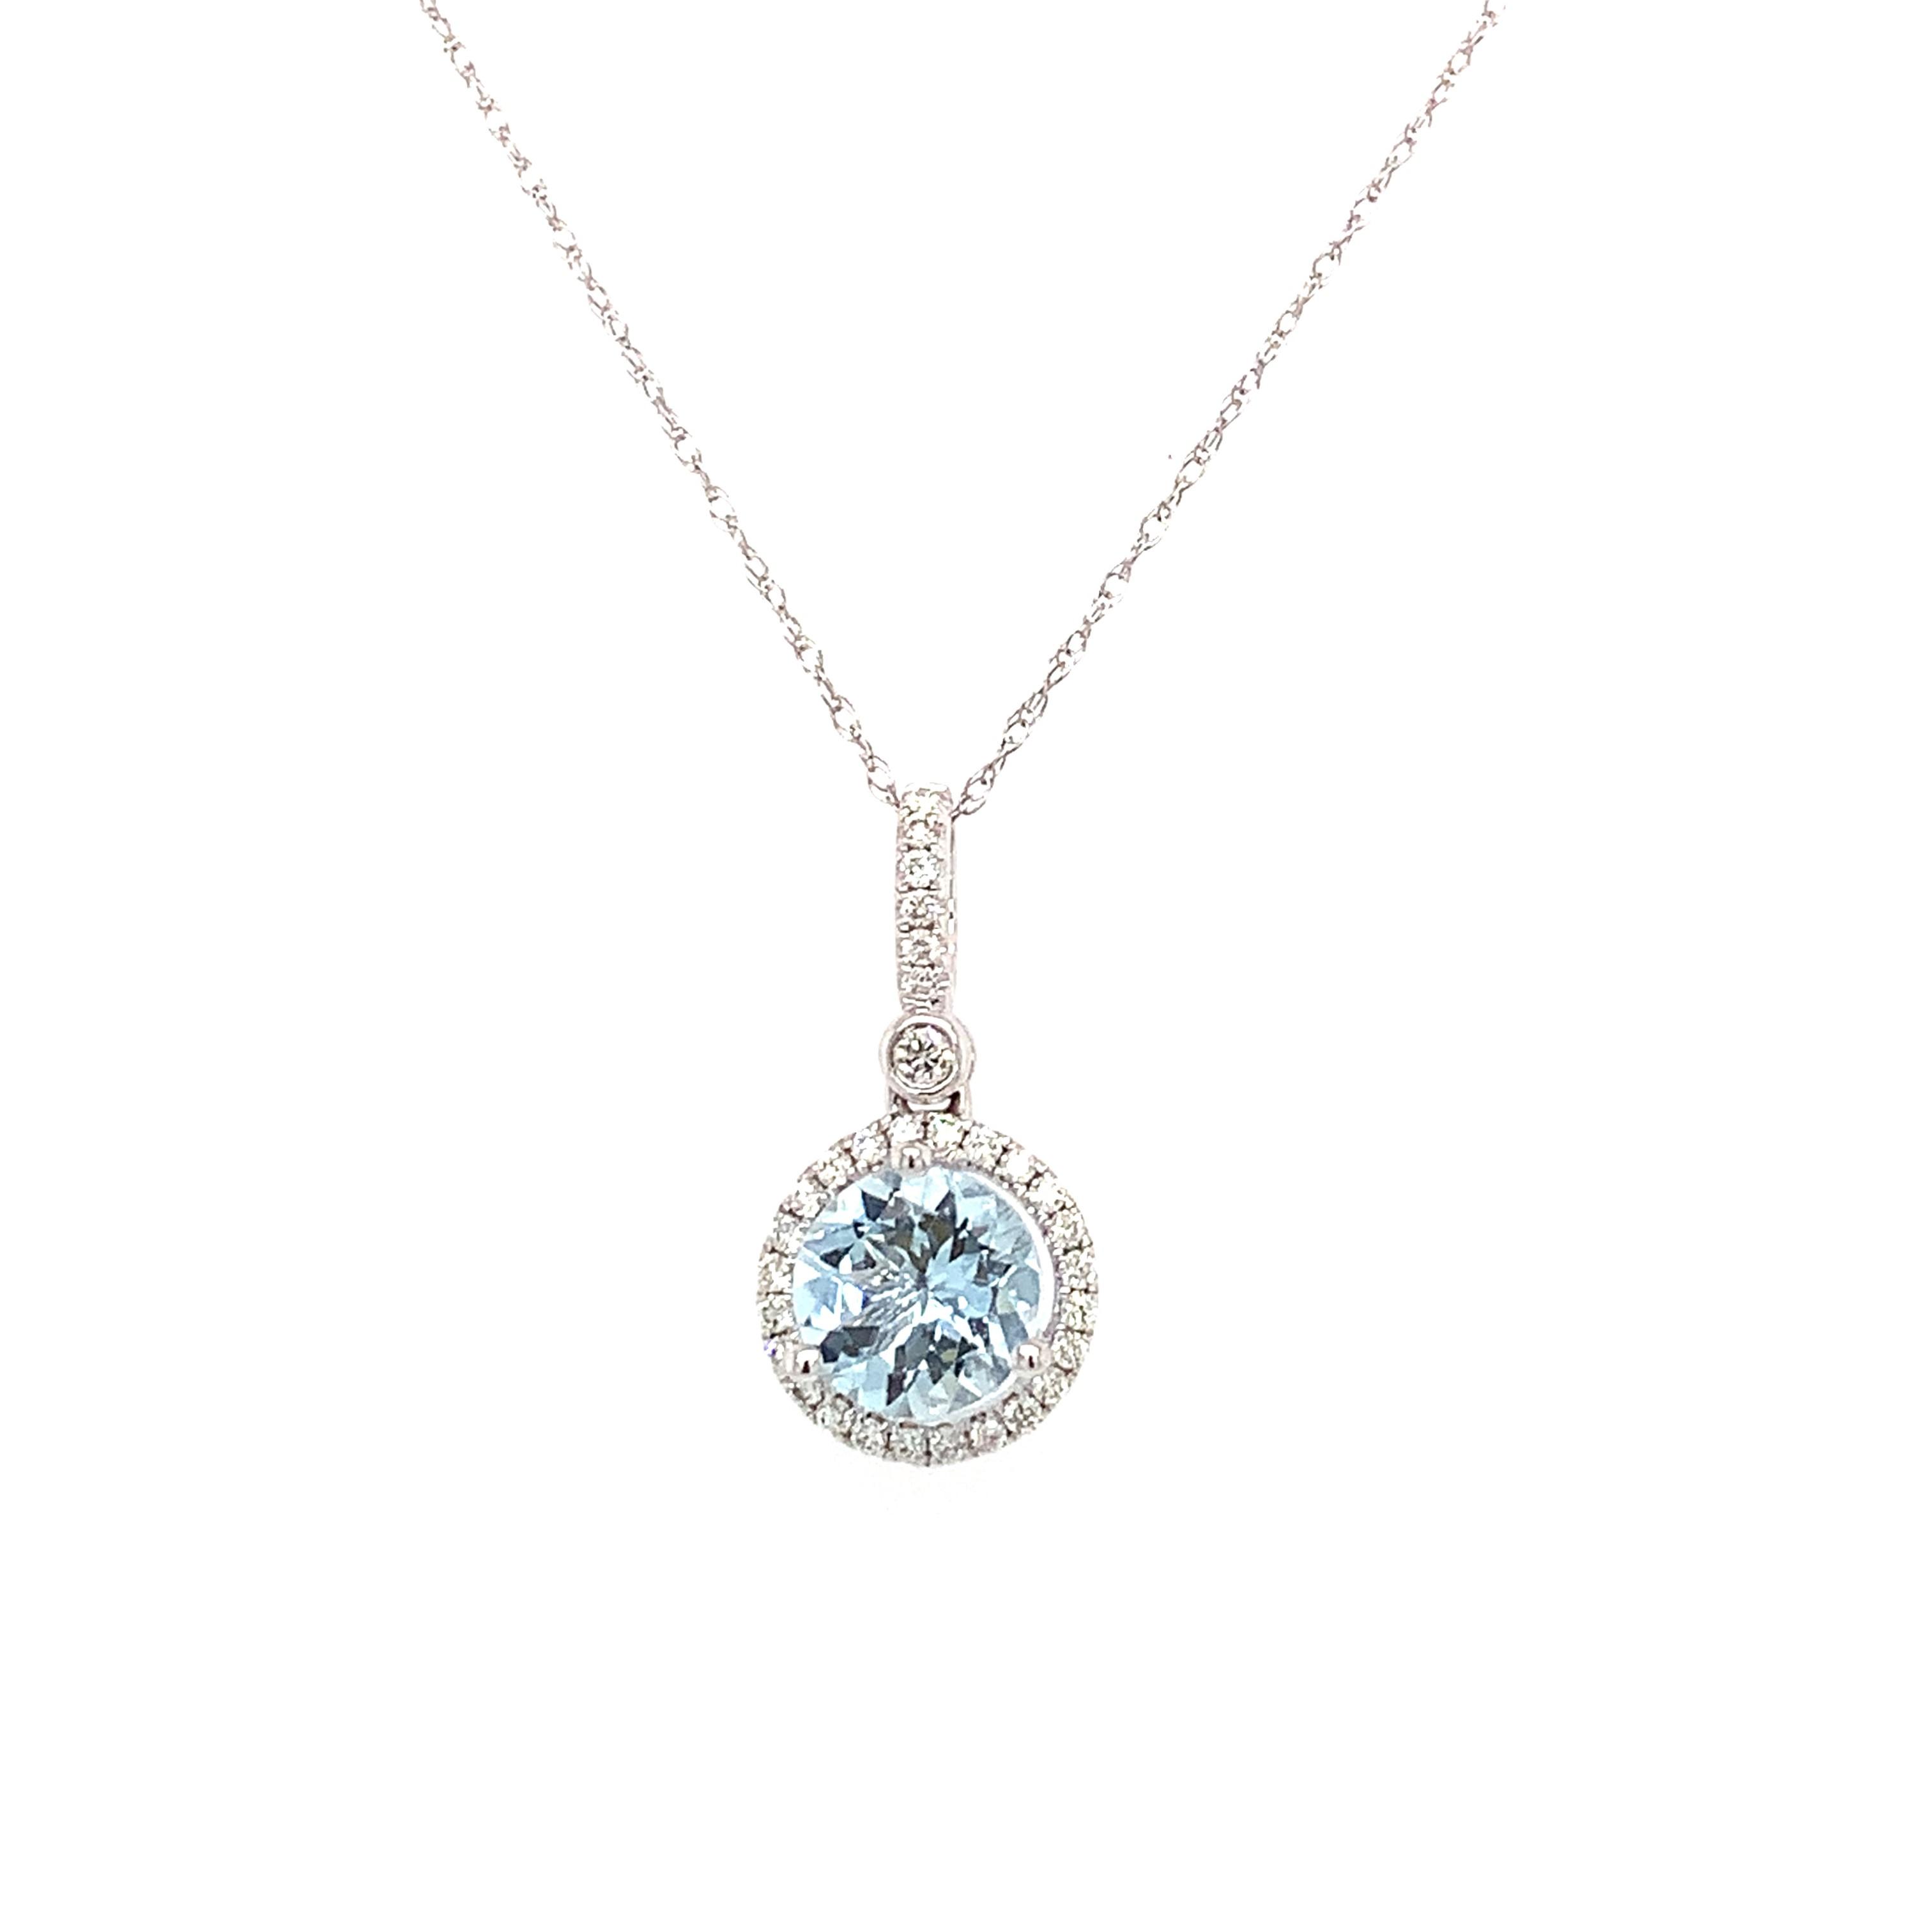 White Gold Aquamarine Pendant Necklace